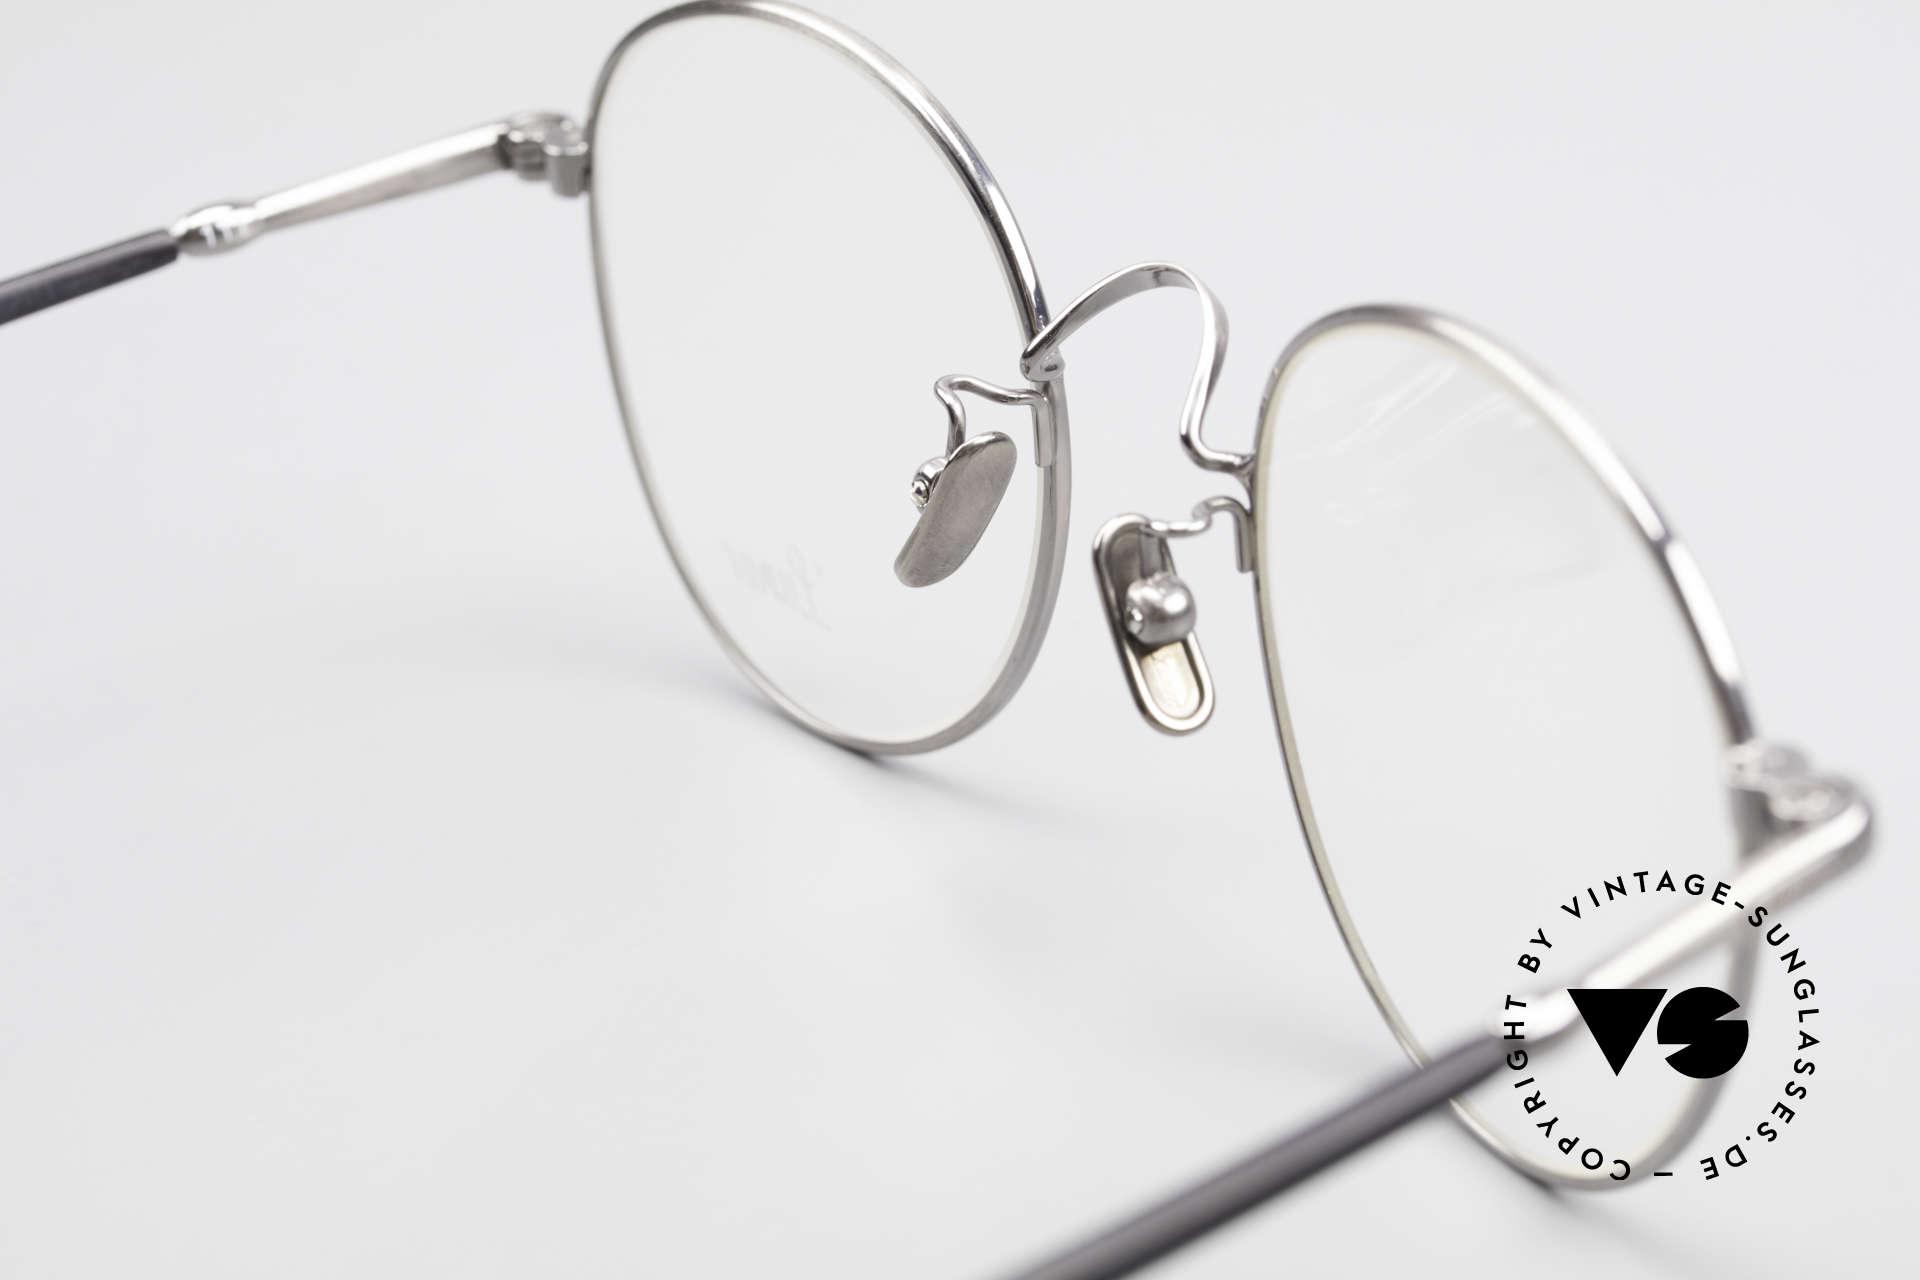 Lunor VA 111 Classy Panto Eyeglasses 2015, Size: large, Made for Men